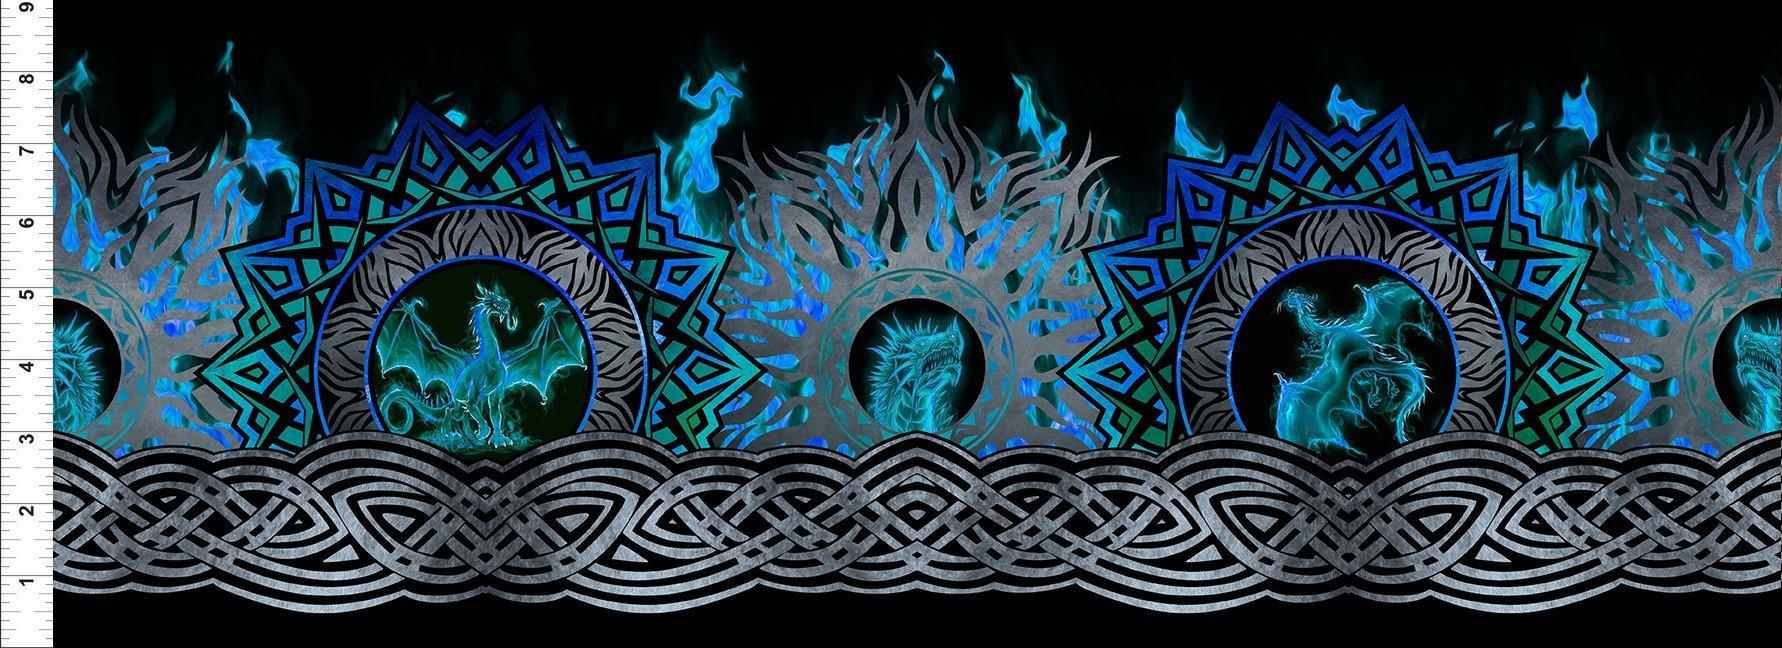 Dragons- Blue Fury Flame Border